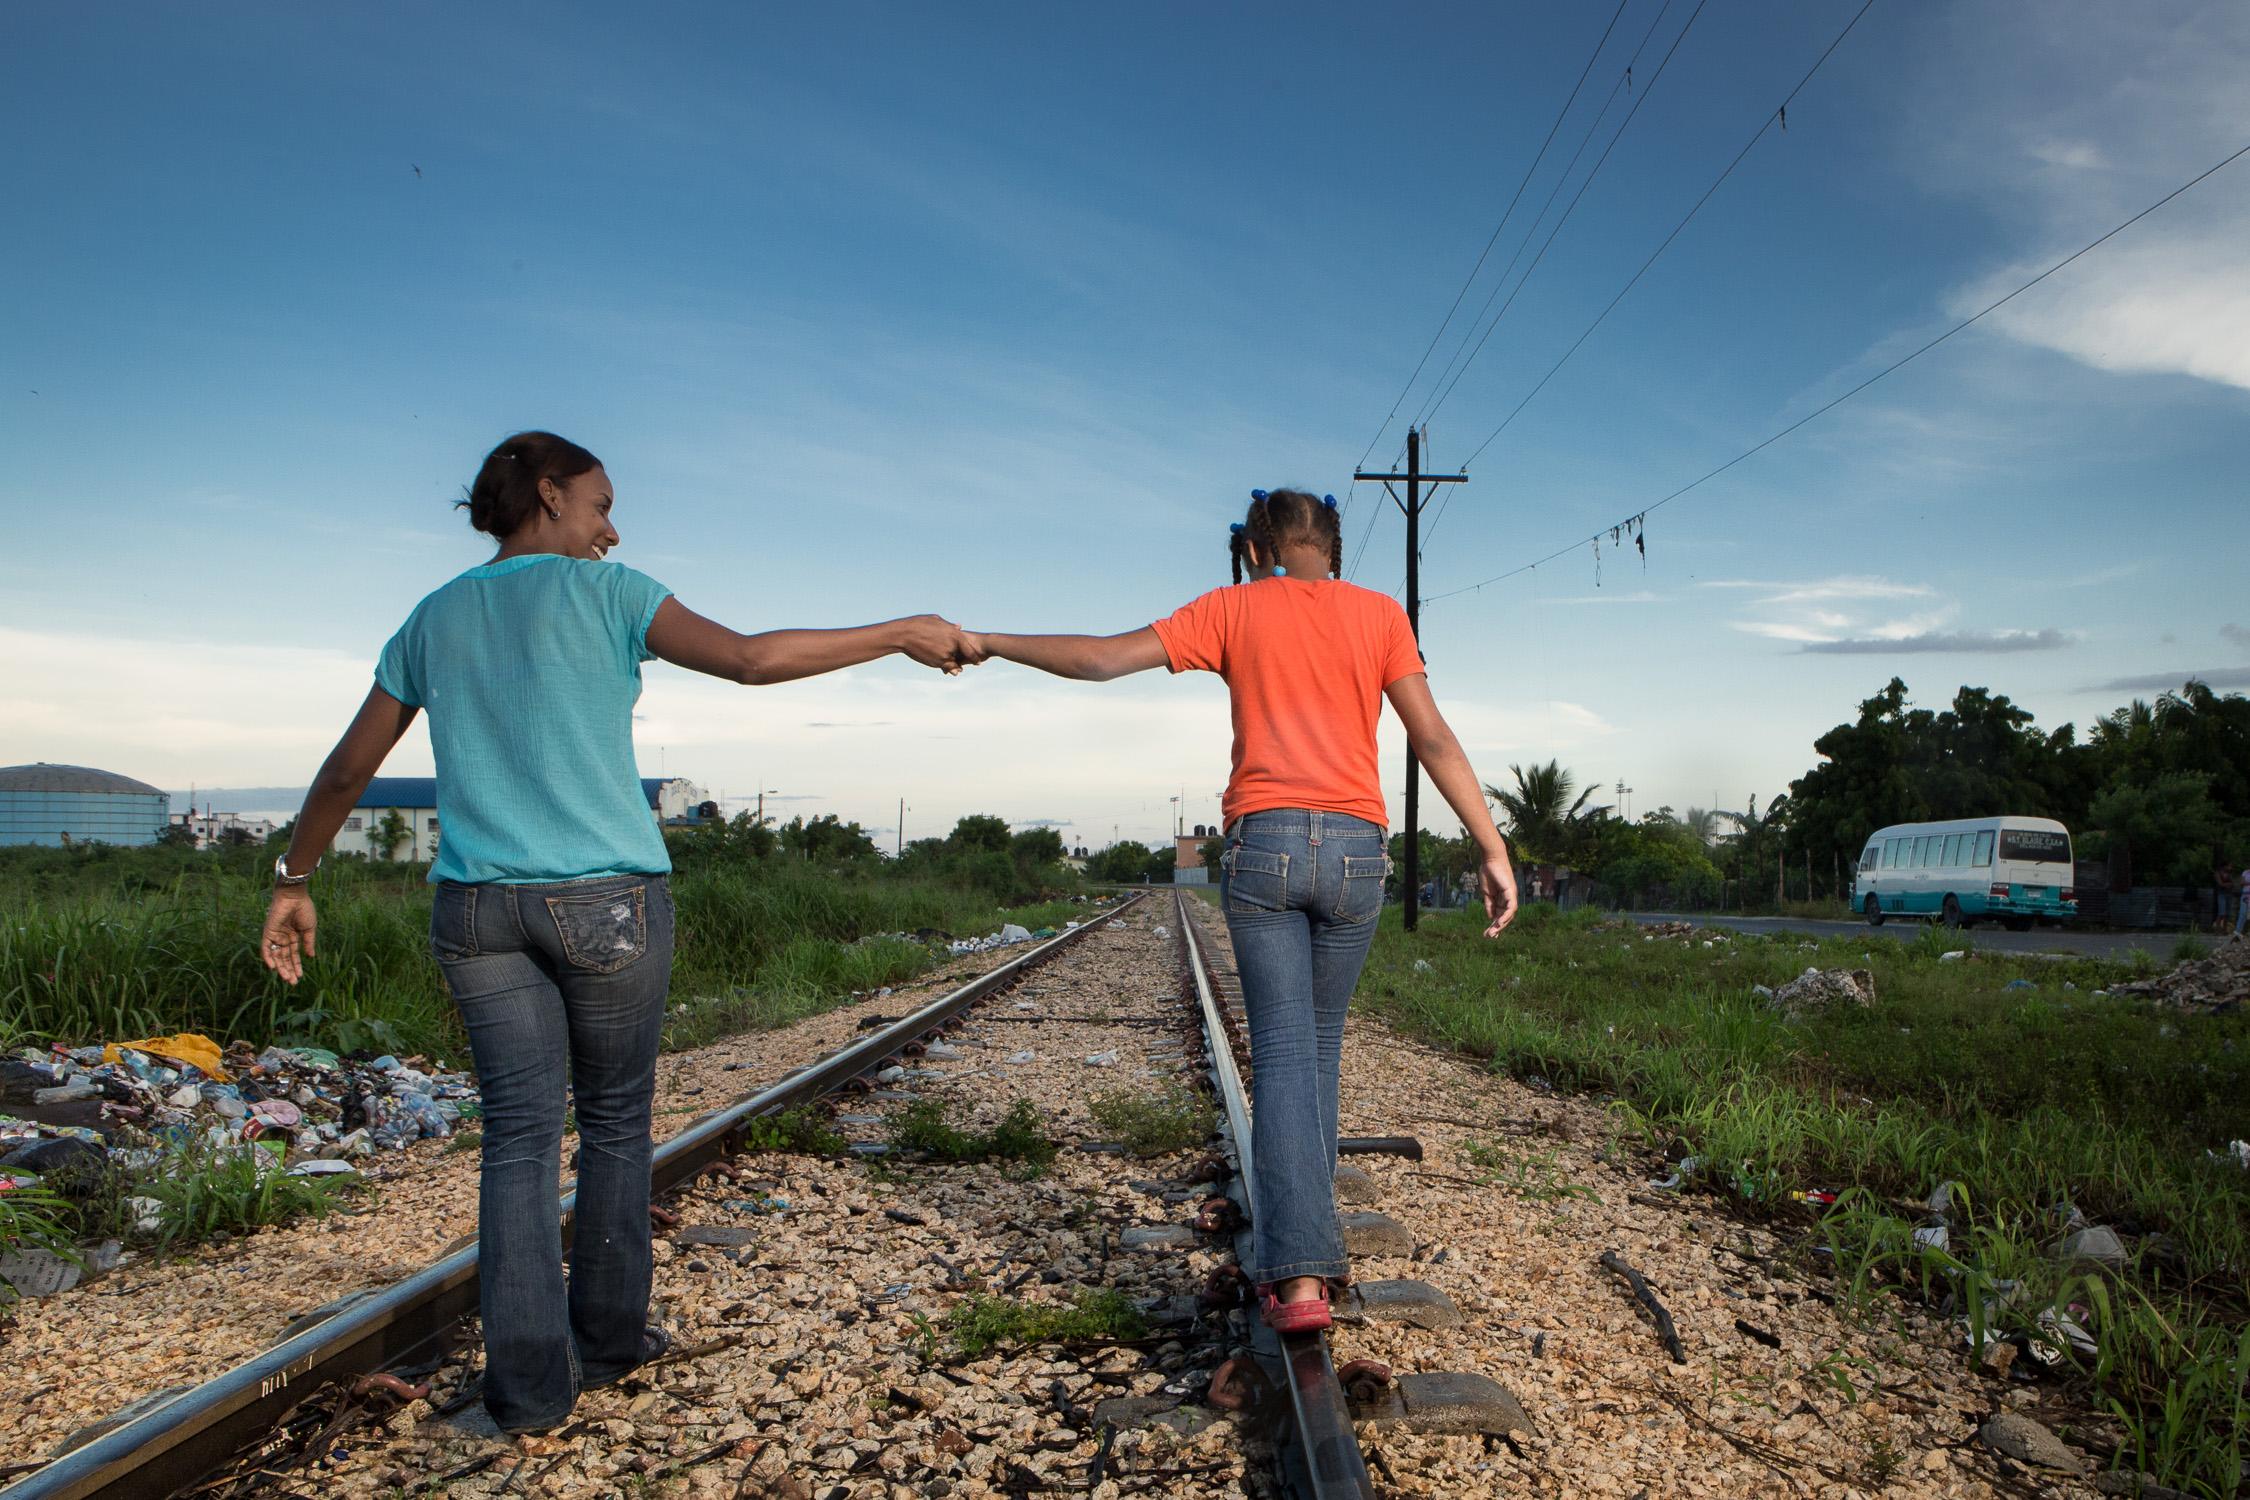 DR_Ginsely&Karina_Tracks_16.jpg